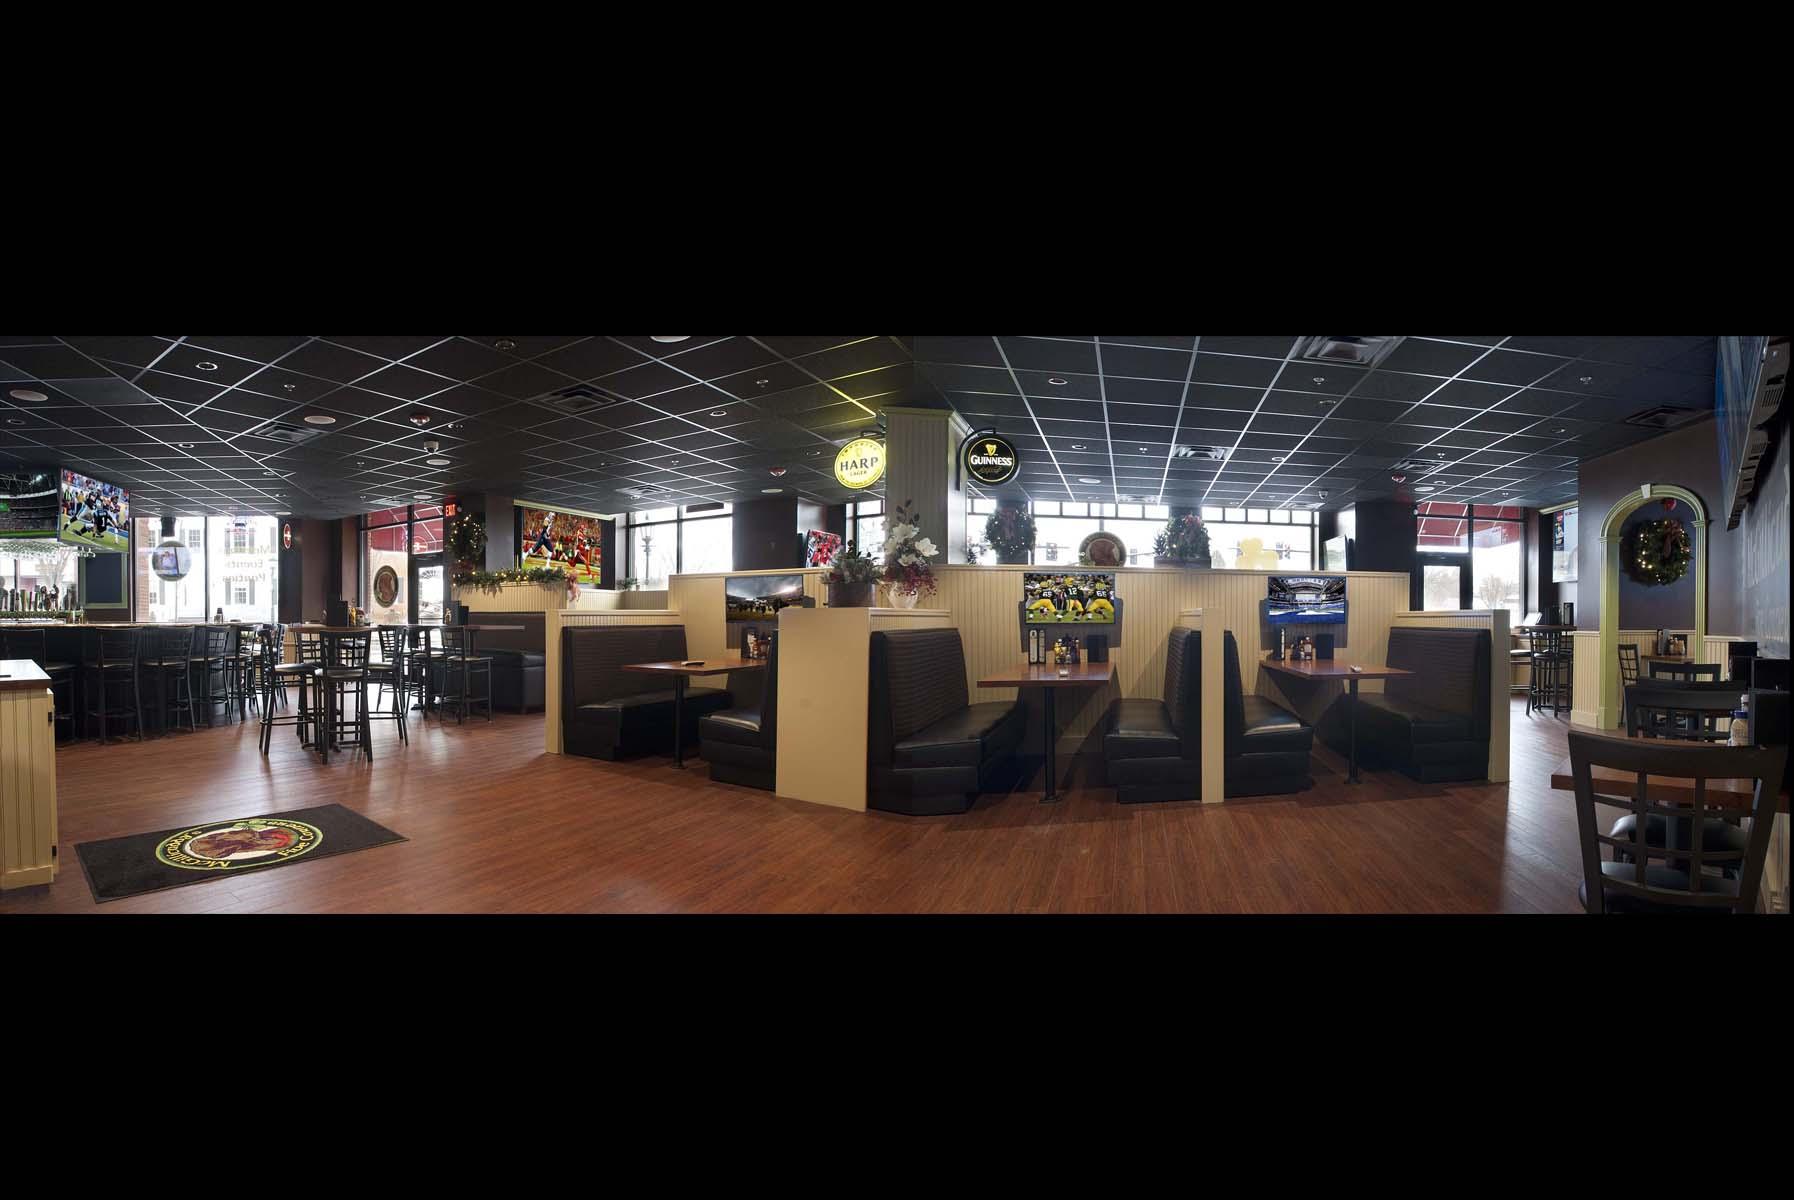 McGillicuddy's Sports Bar